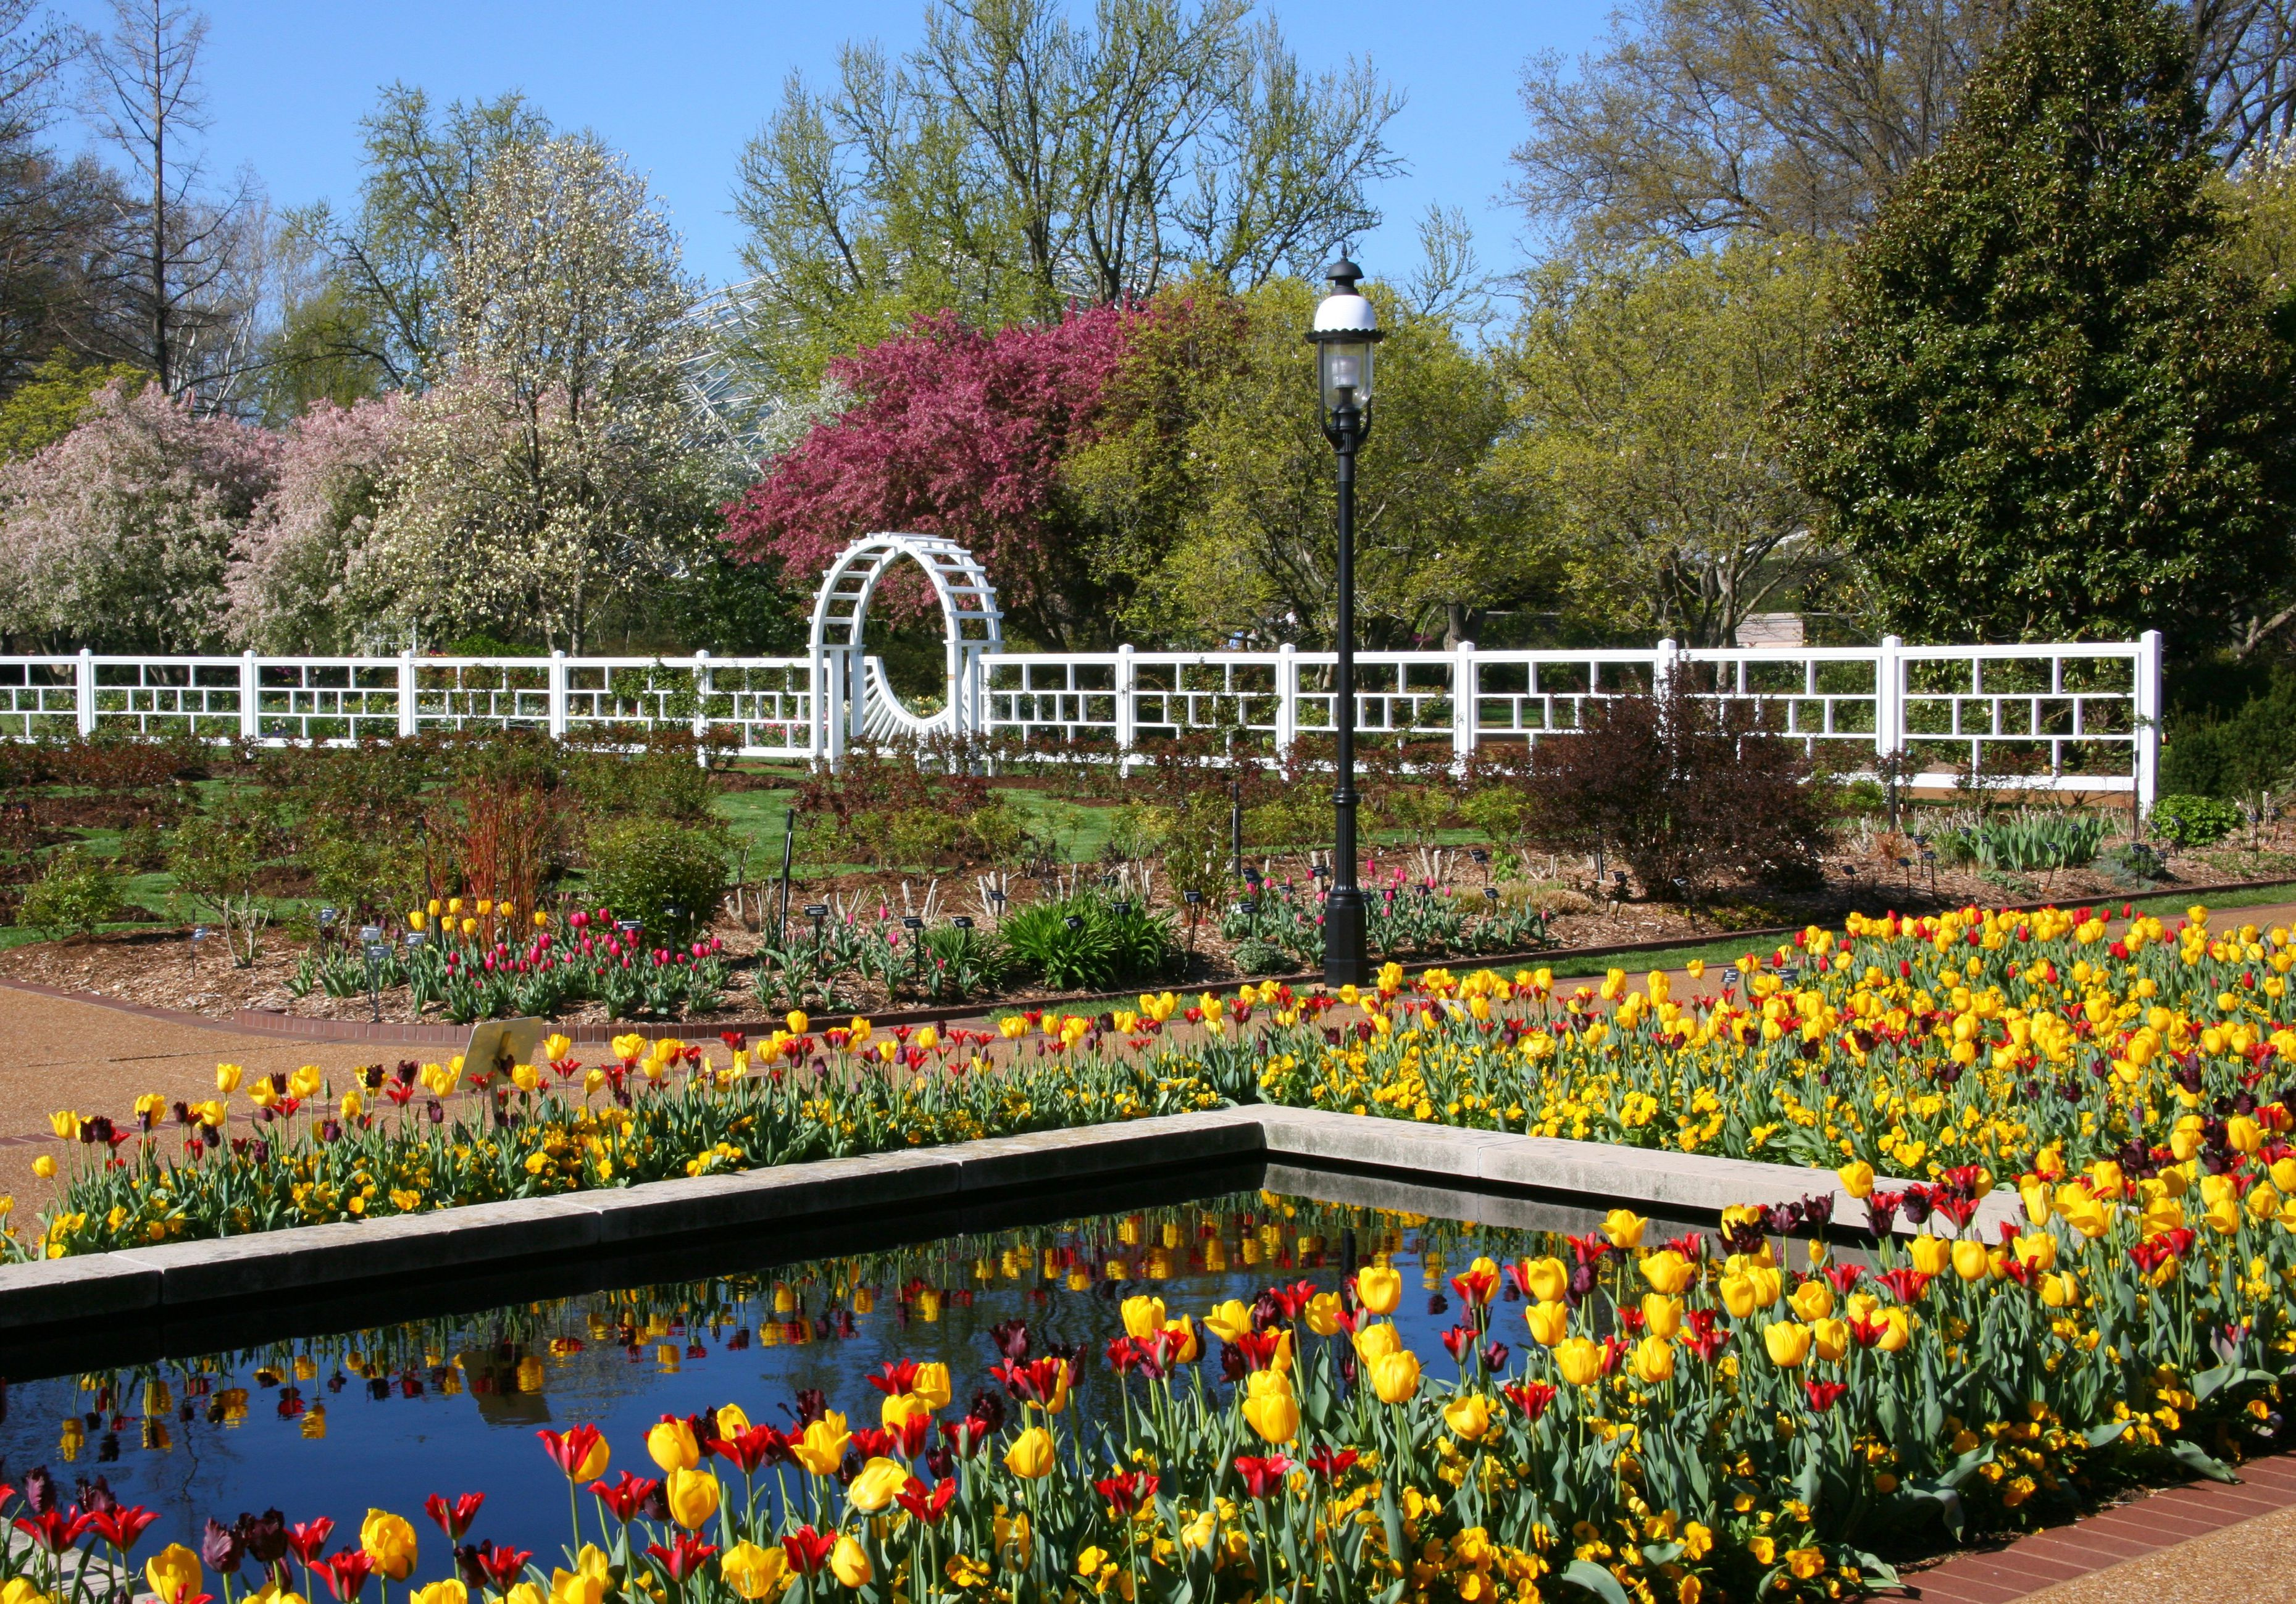 Missouri Botanical Garden in the Shaw neighborhood of St. Louis